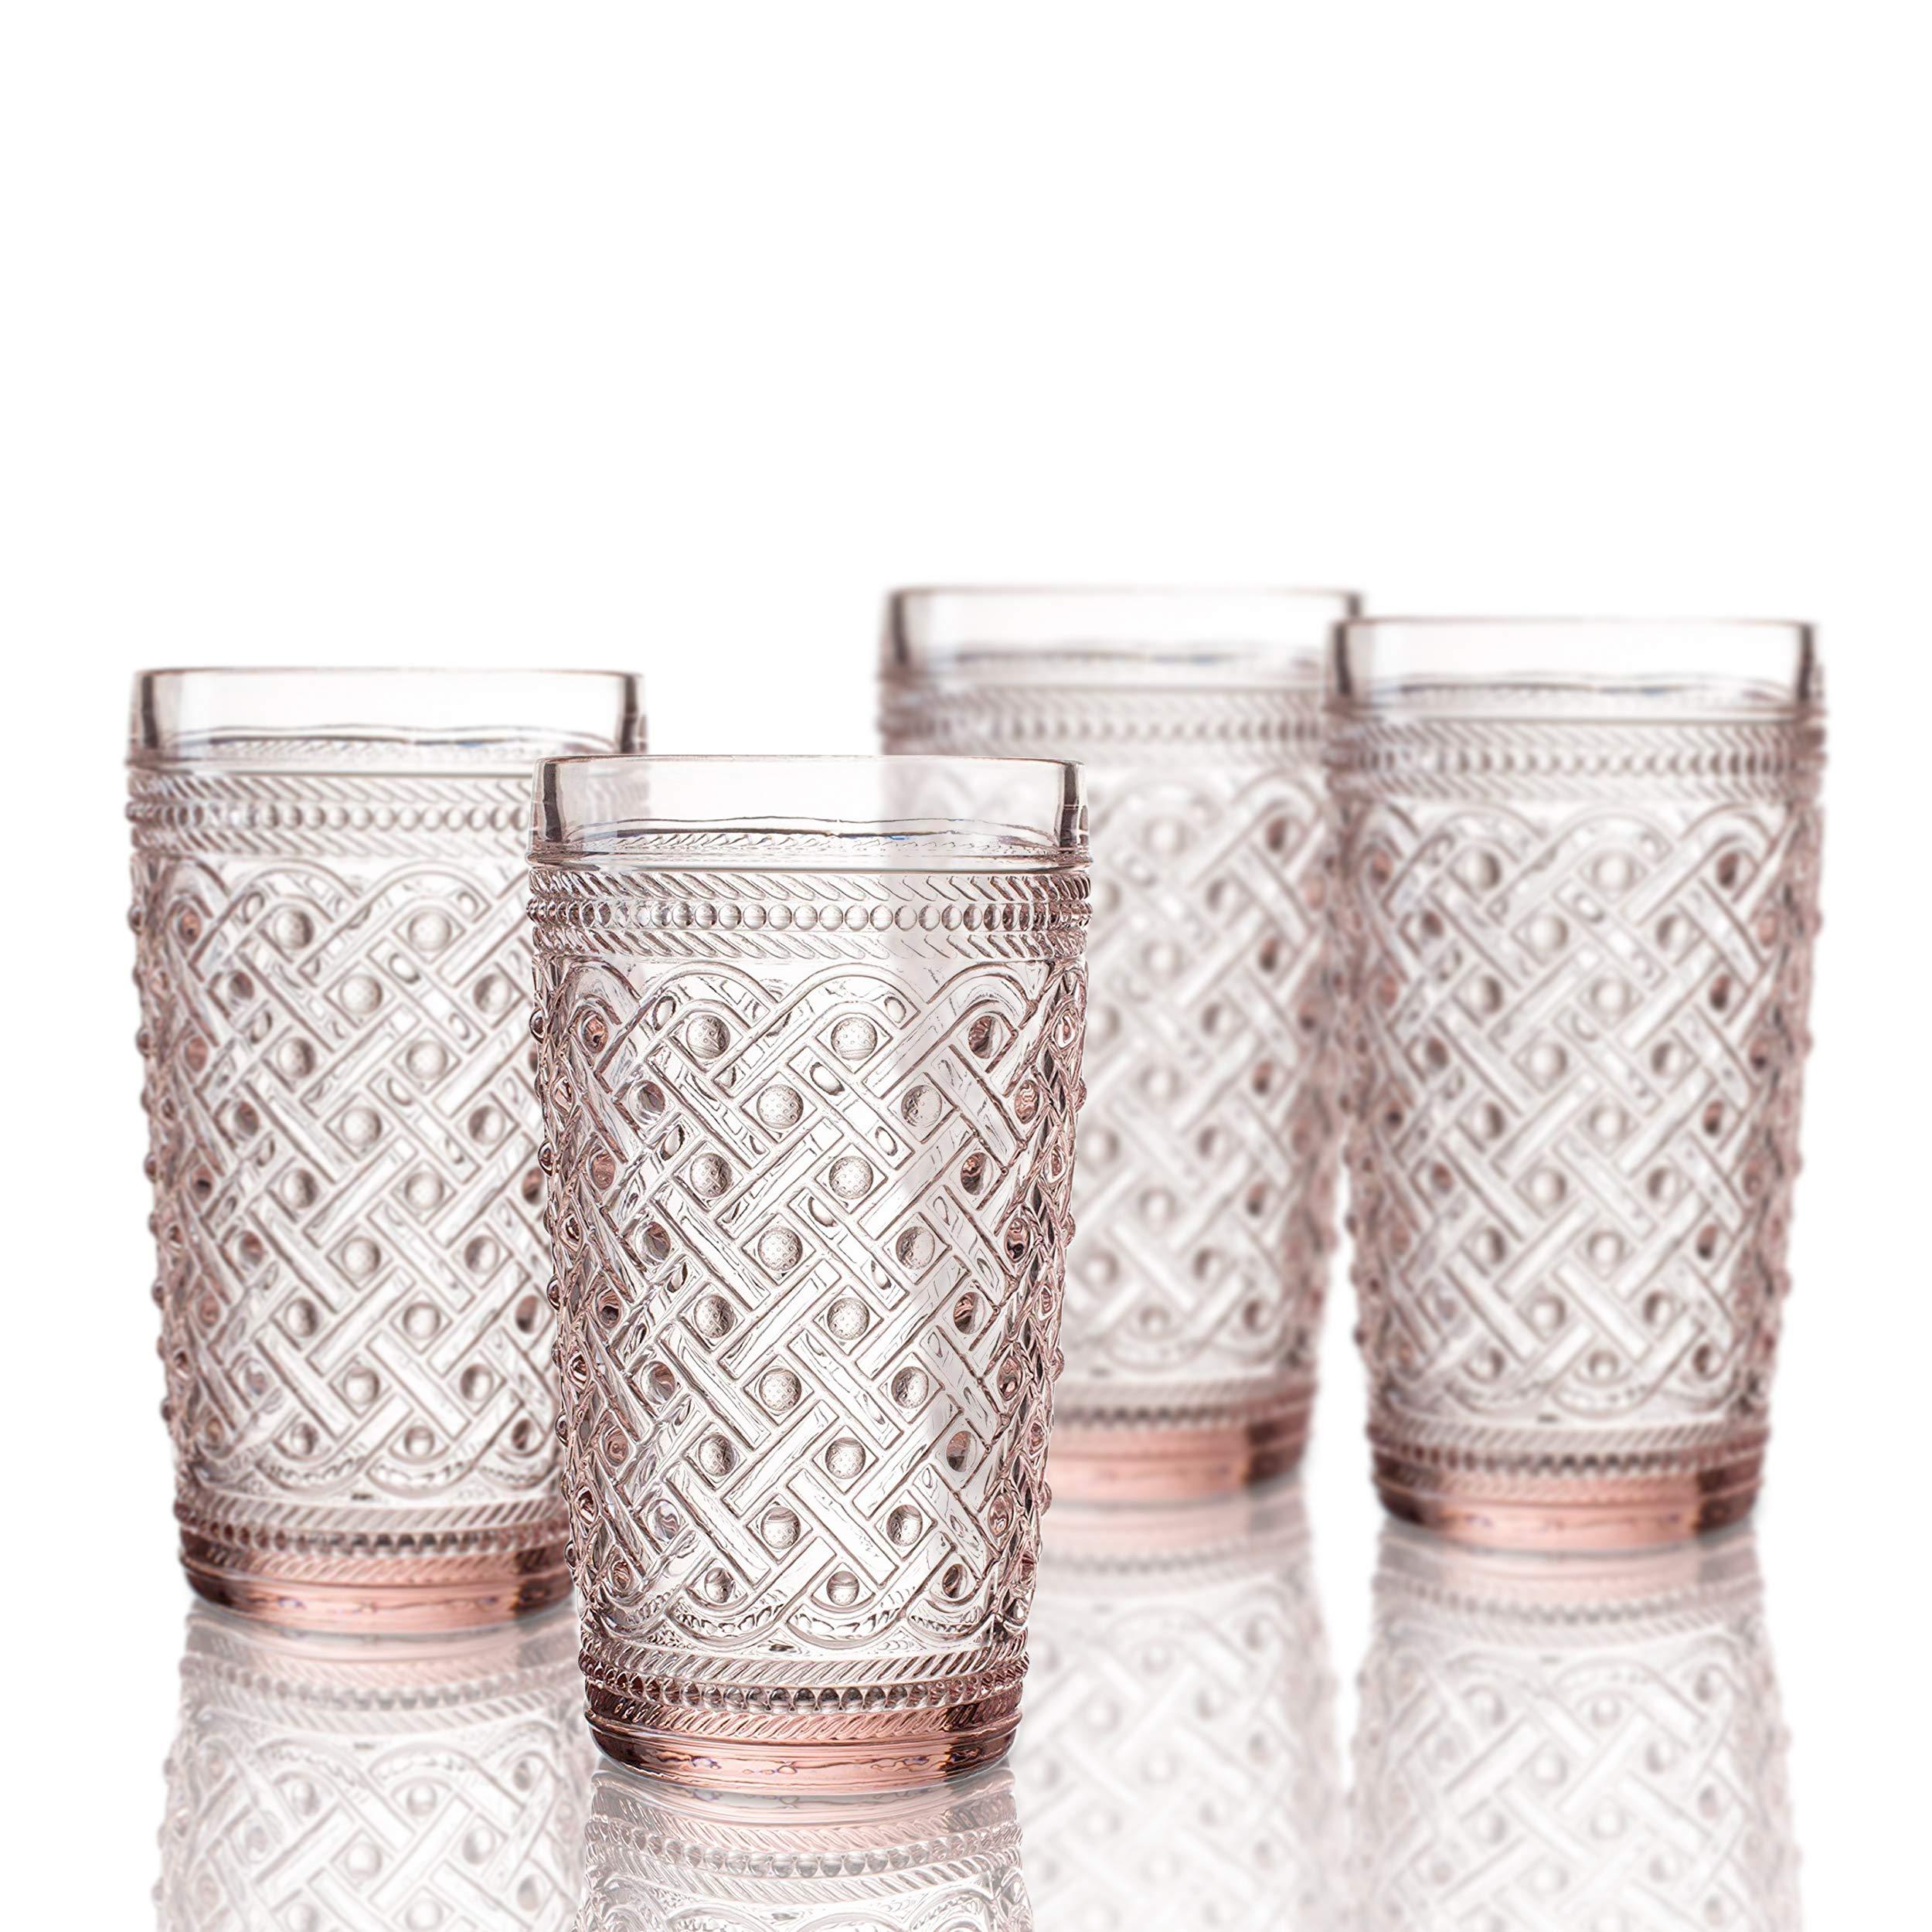 Elle Decor 229807-4HBPU Bistro Ikat 4 Pc Set Highball, Pink-Glass Elegant Barware and Drinkware, Dishwasher Safe, 13 oz,